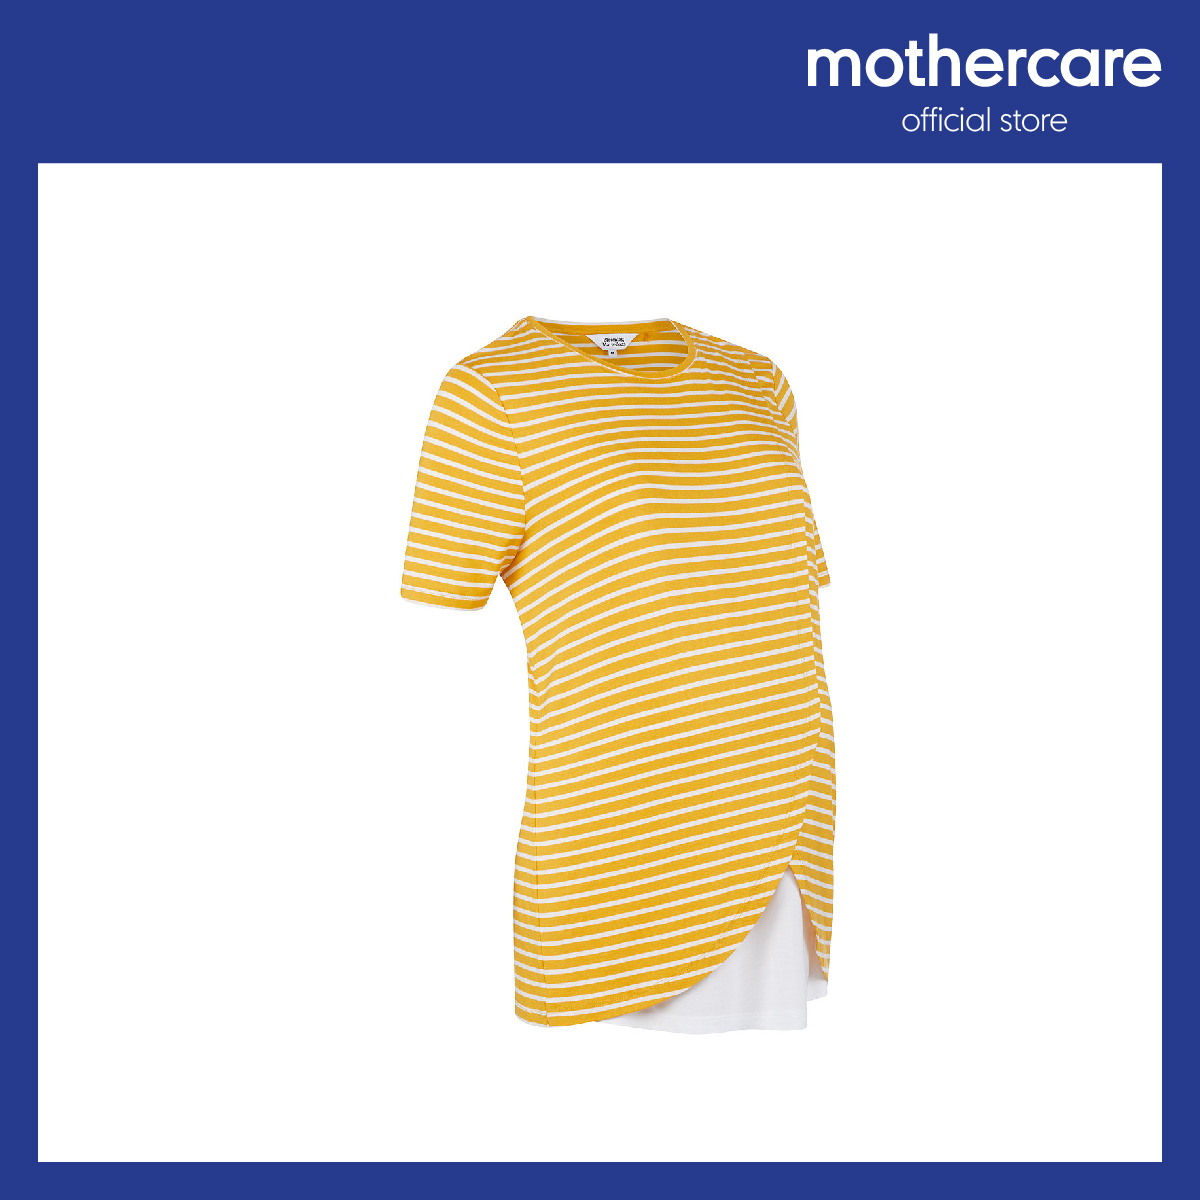 Mothercare Nursing Top Materanity Feeding Top Shirts Wrap Front Top